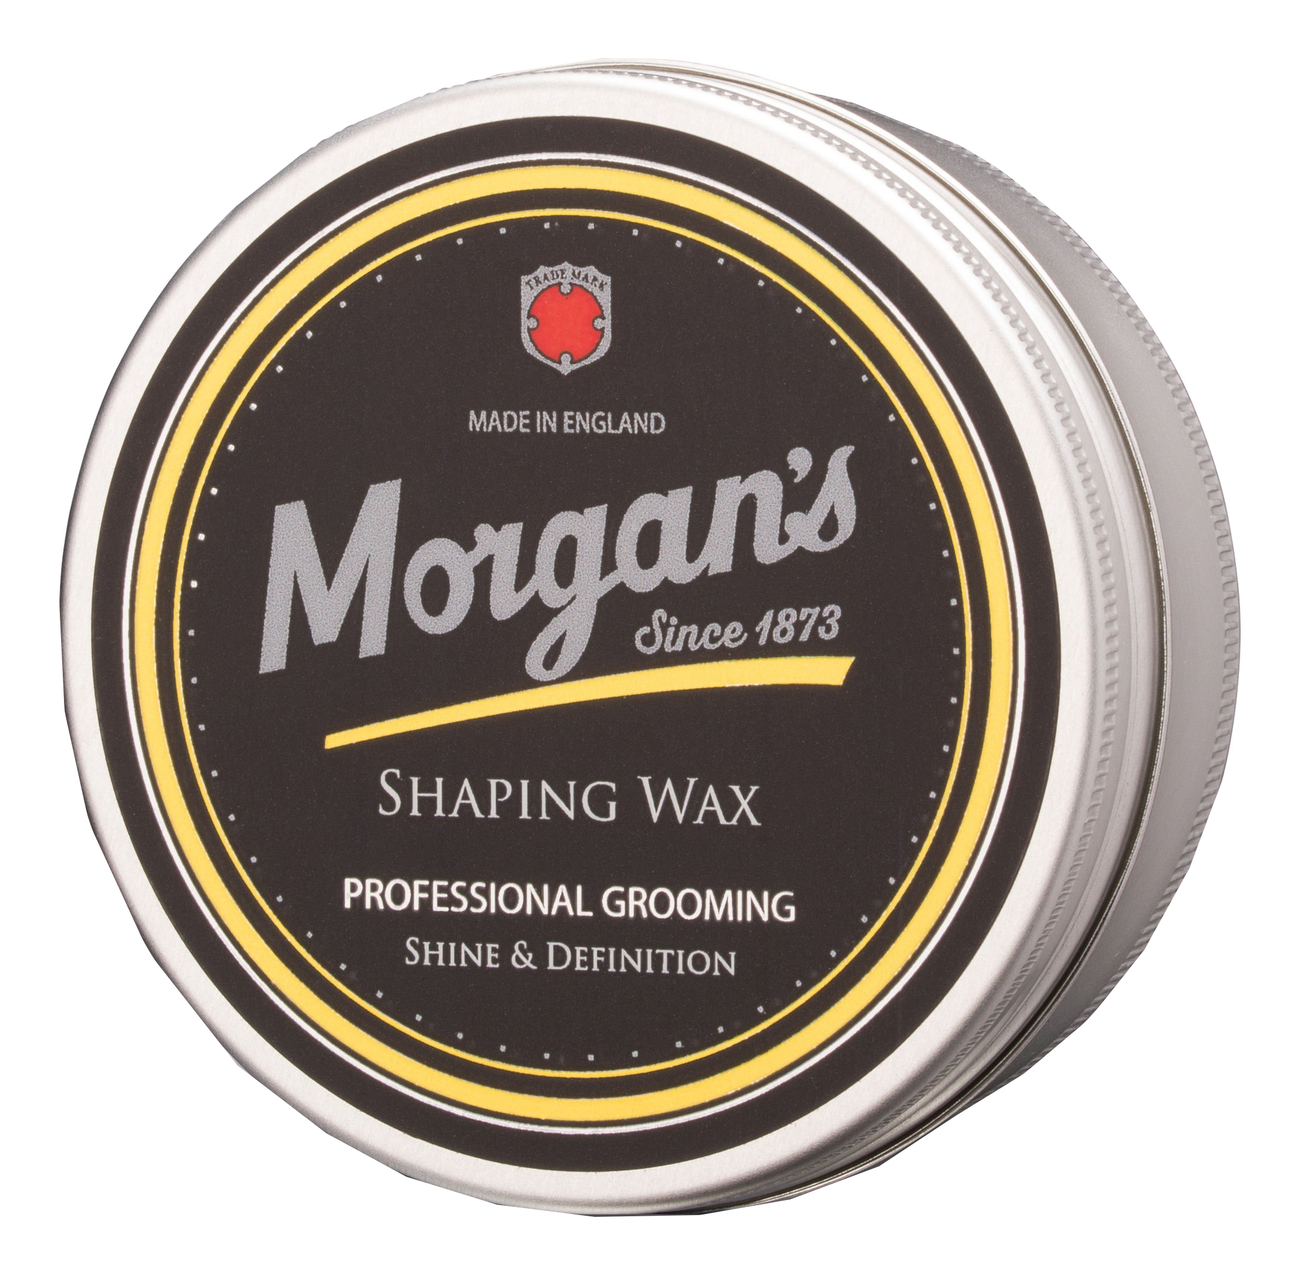 Формирующий воск для укладки волос Shaping Wax 75мл